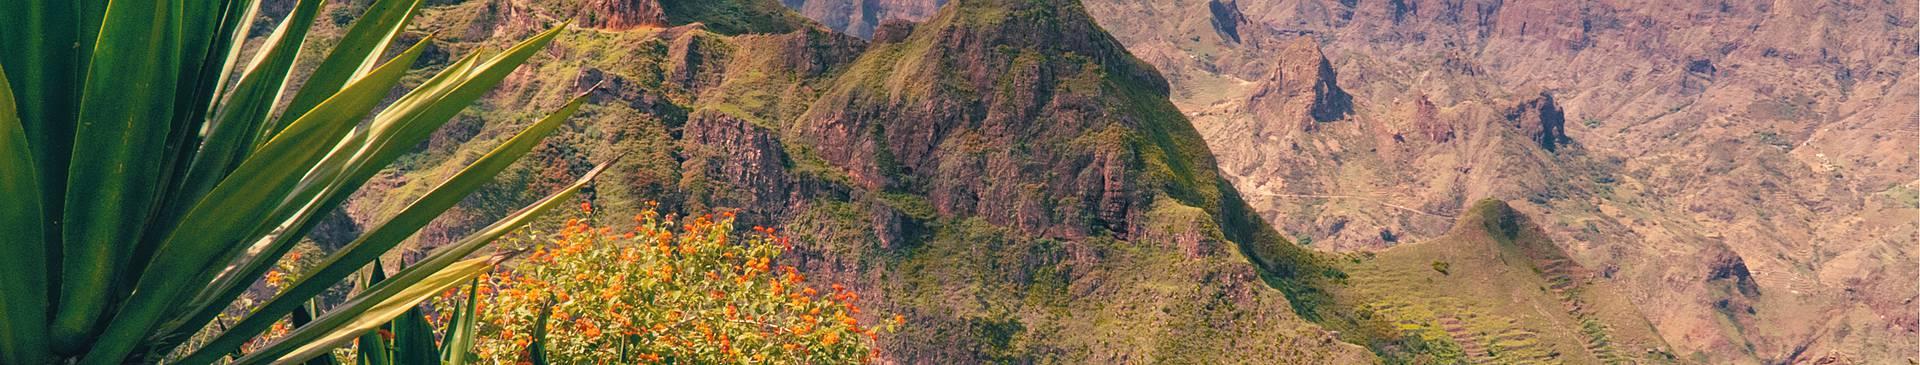 Bergurlaub Kapverden